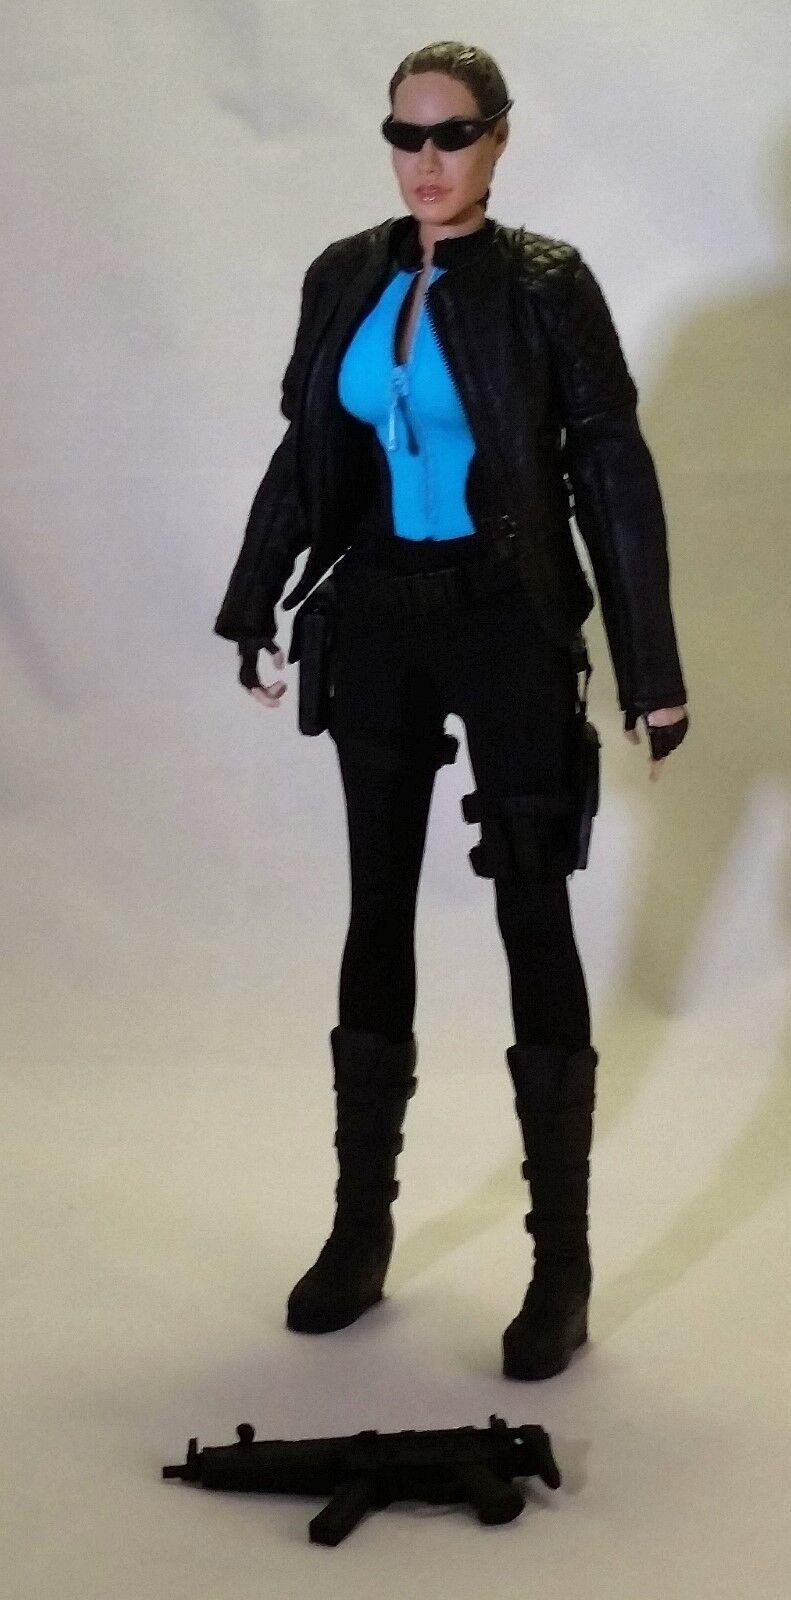 1/6 Custom Lara Croft Tomb Raider En Negro outfita, coqueta, Cy Girl, Triad Juguete